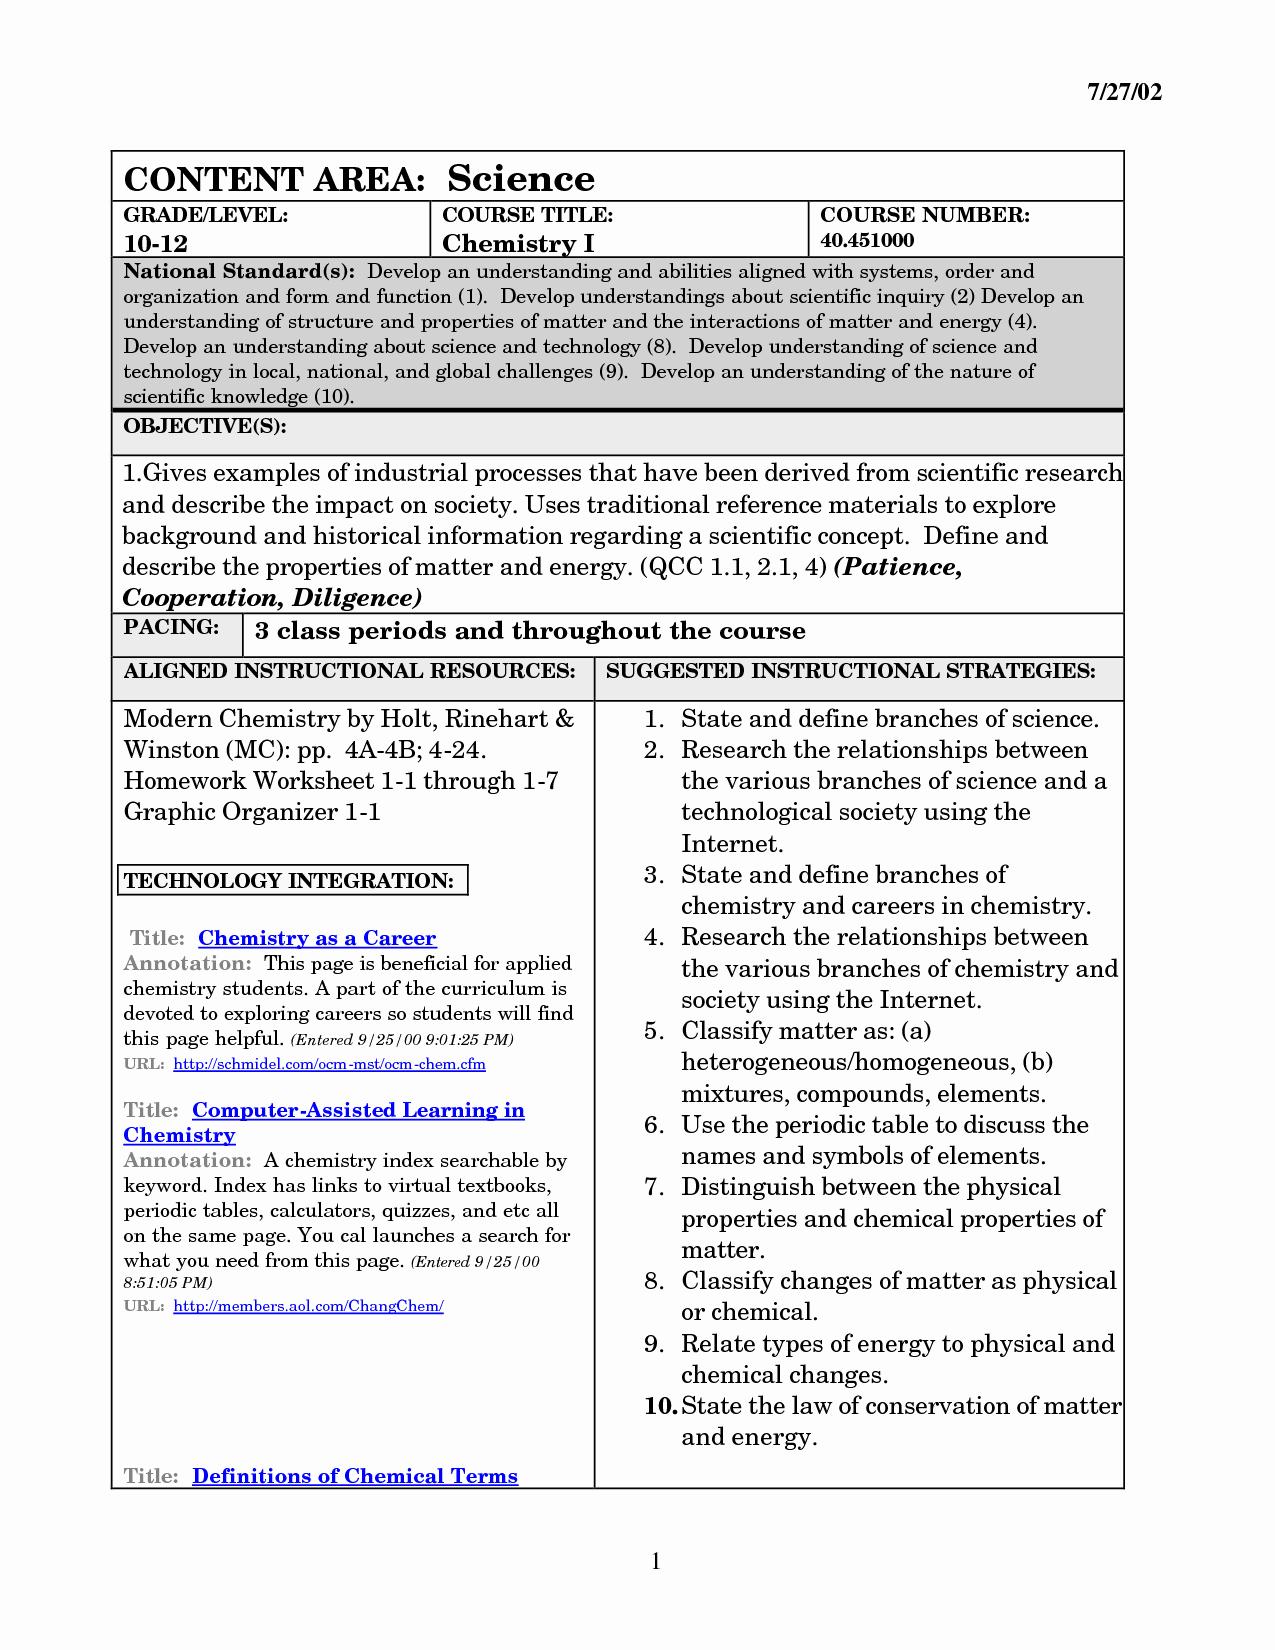 Composition Of Matter Worksheet Lovely 15 Best Of Nuclear Chemistry Worksheet Answer Key